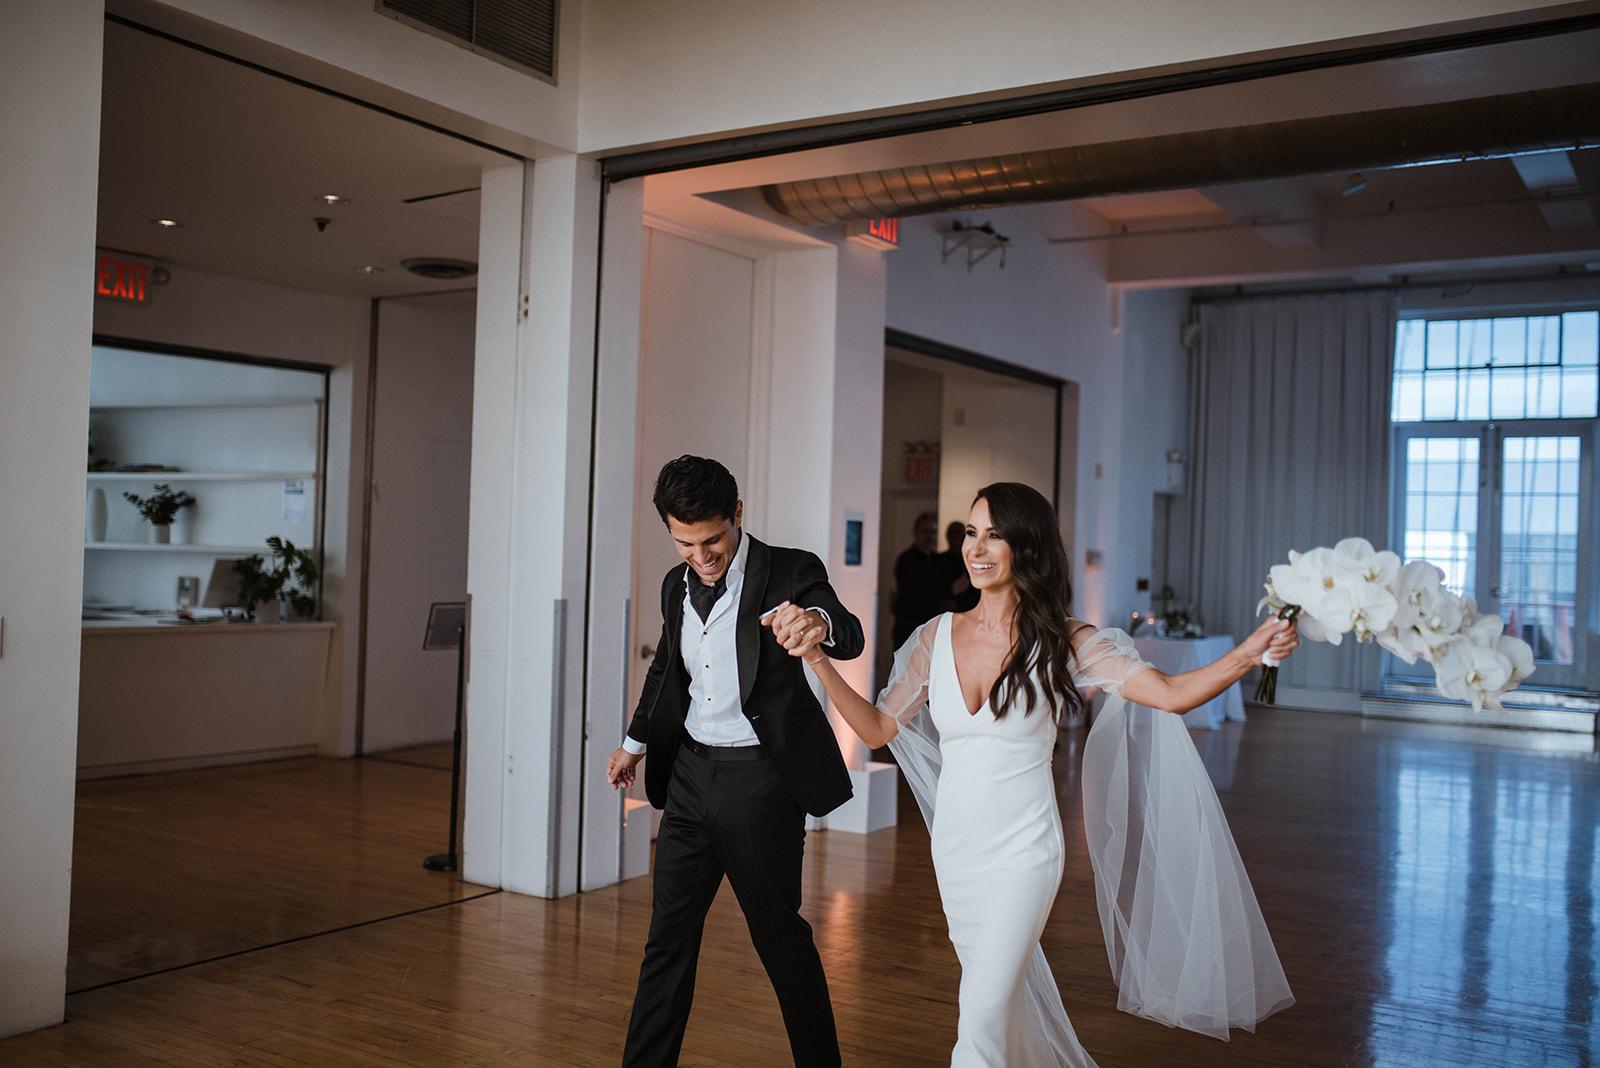 Jenna___Austin_Wedding_Day-_LHP-744.jpg